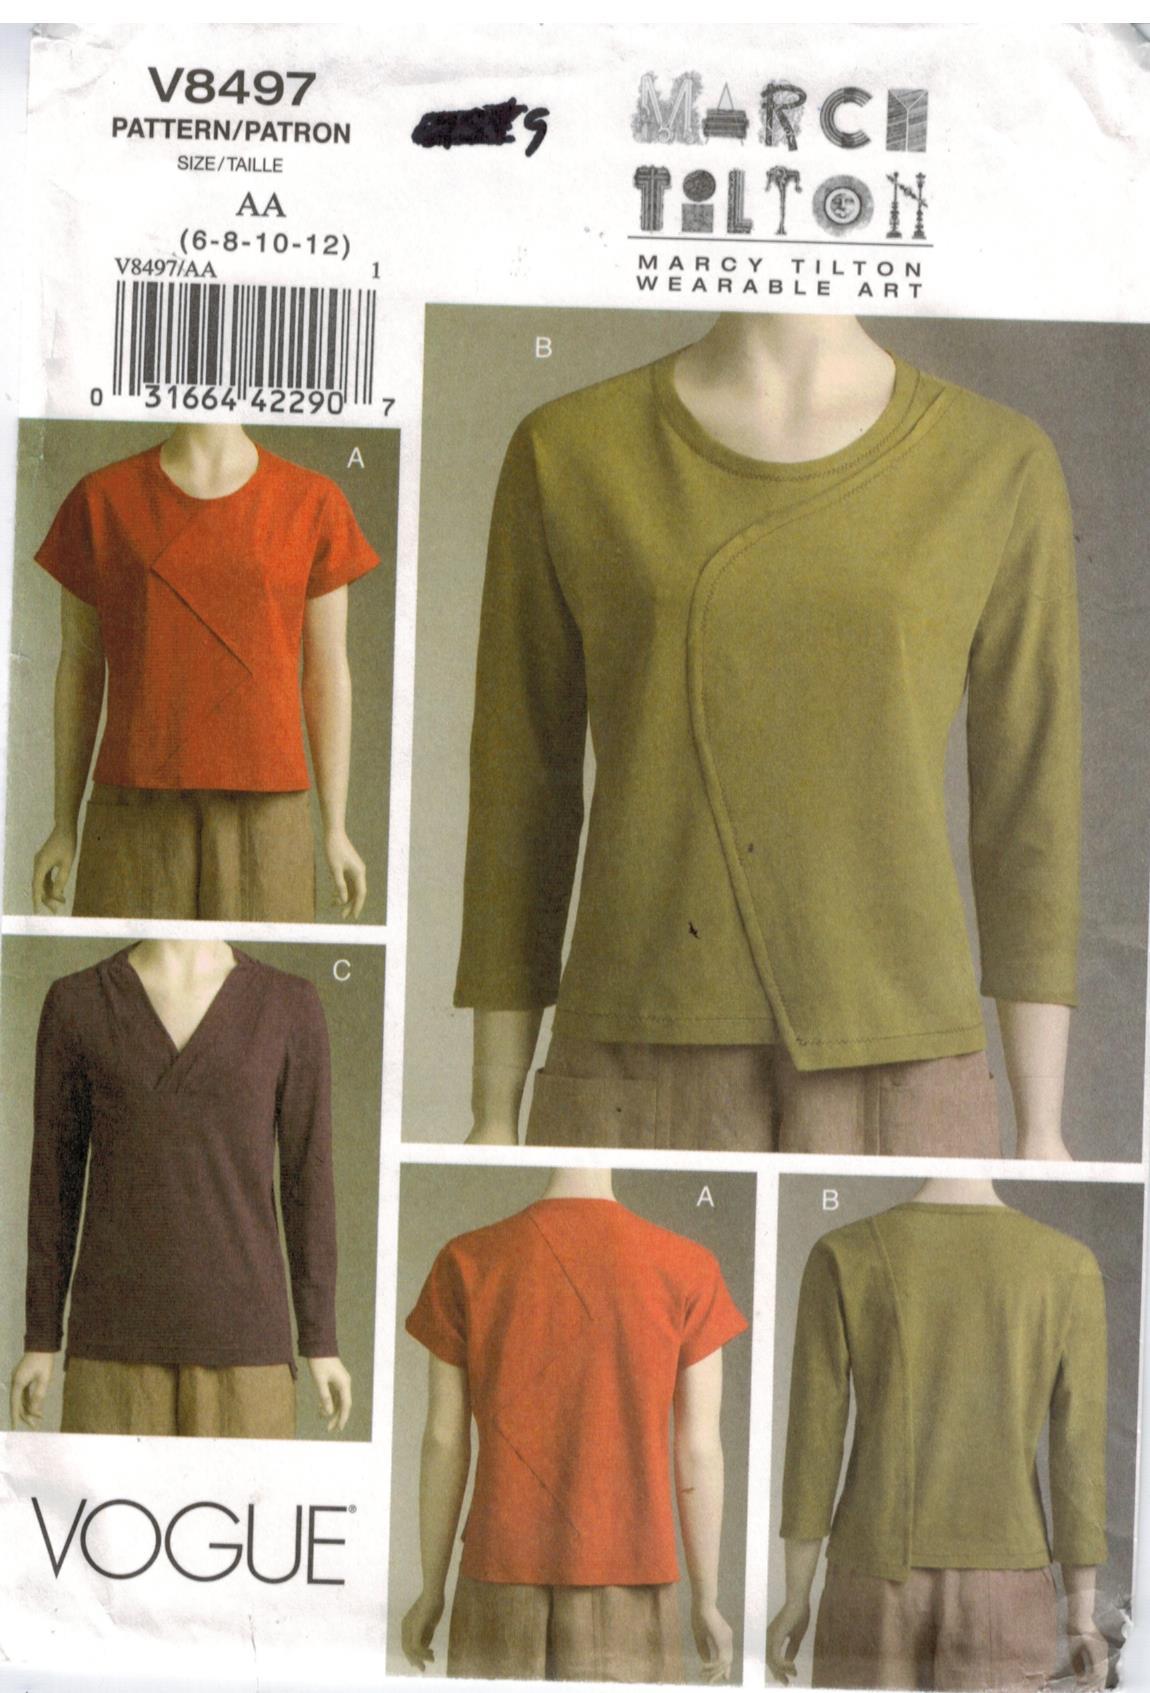 Vogue Pattern 12 Marcy Tilton designer wearable art knit tops ...